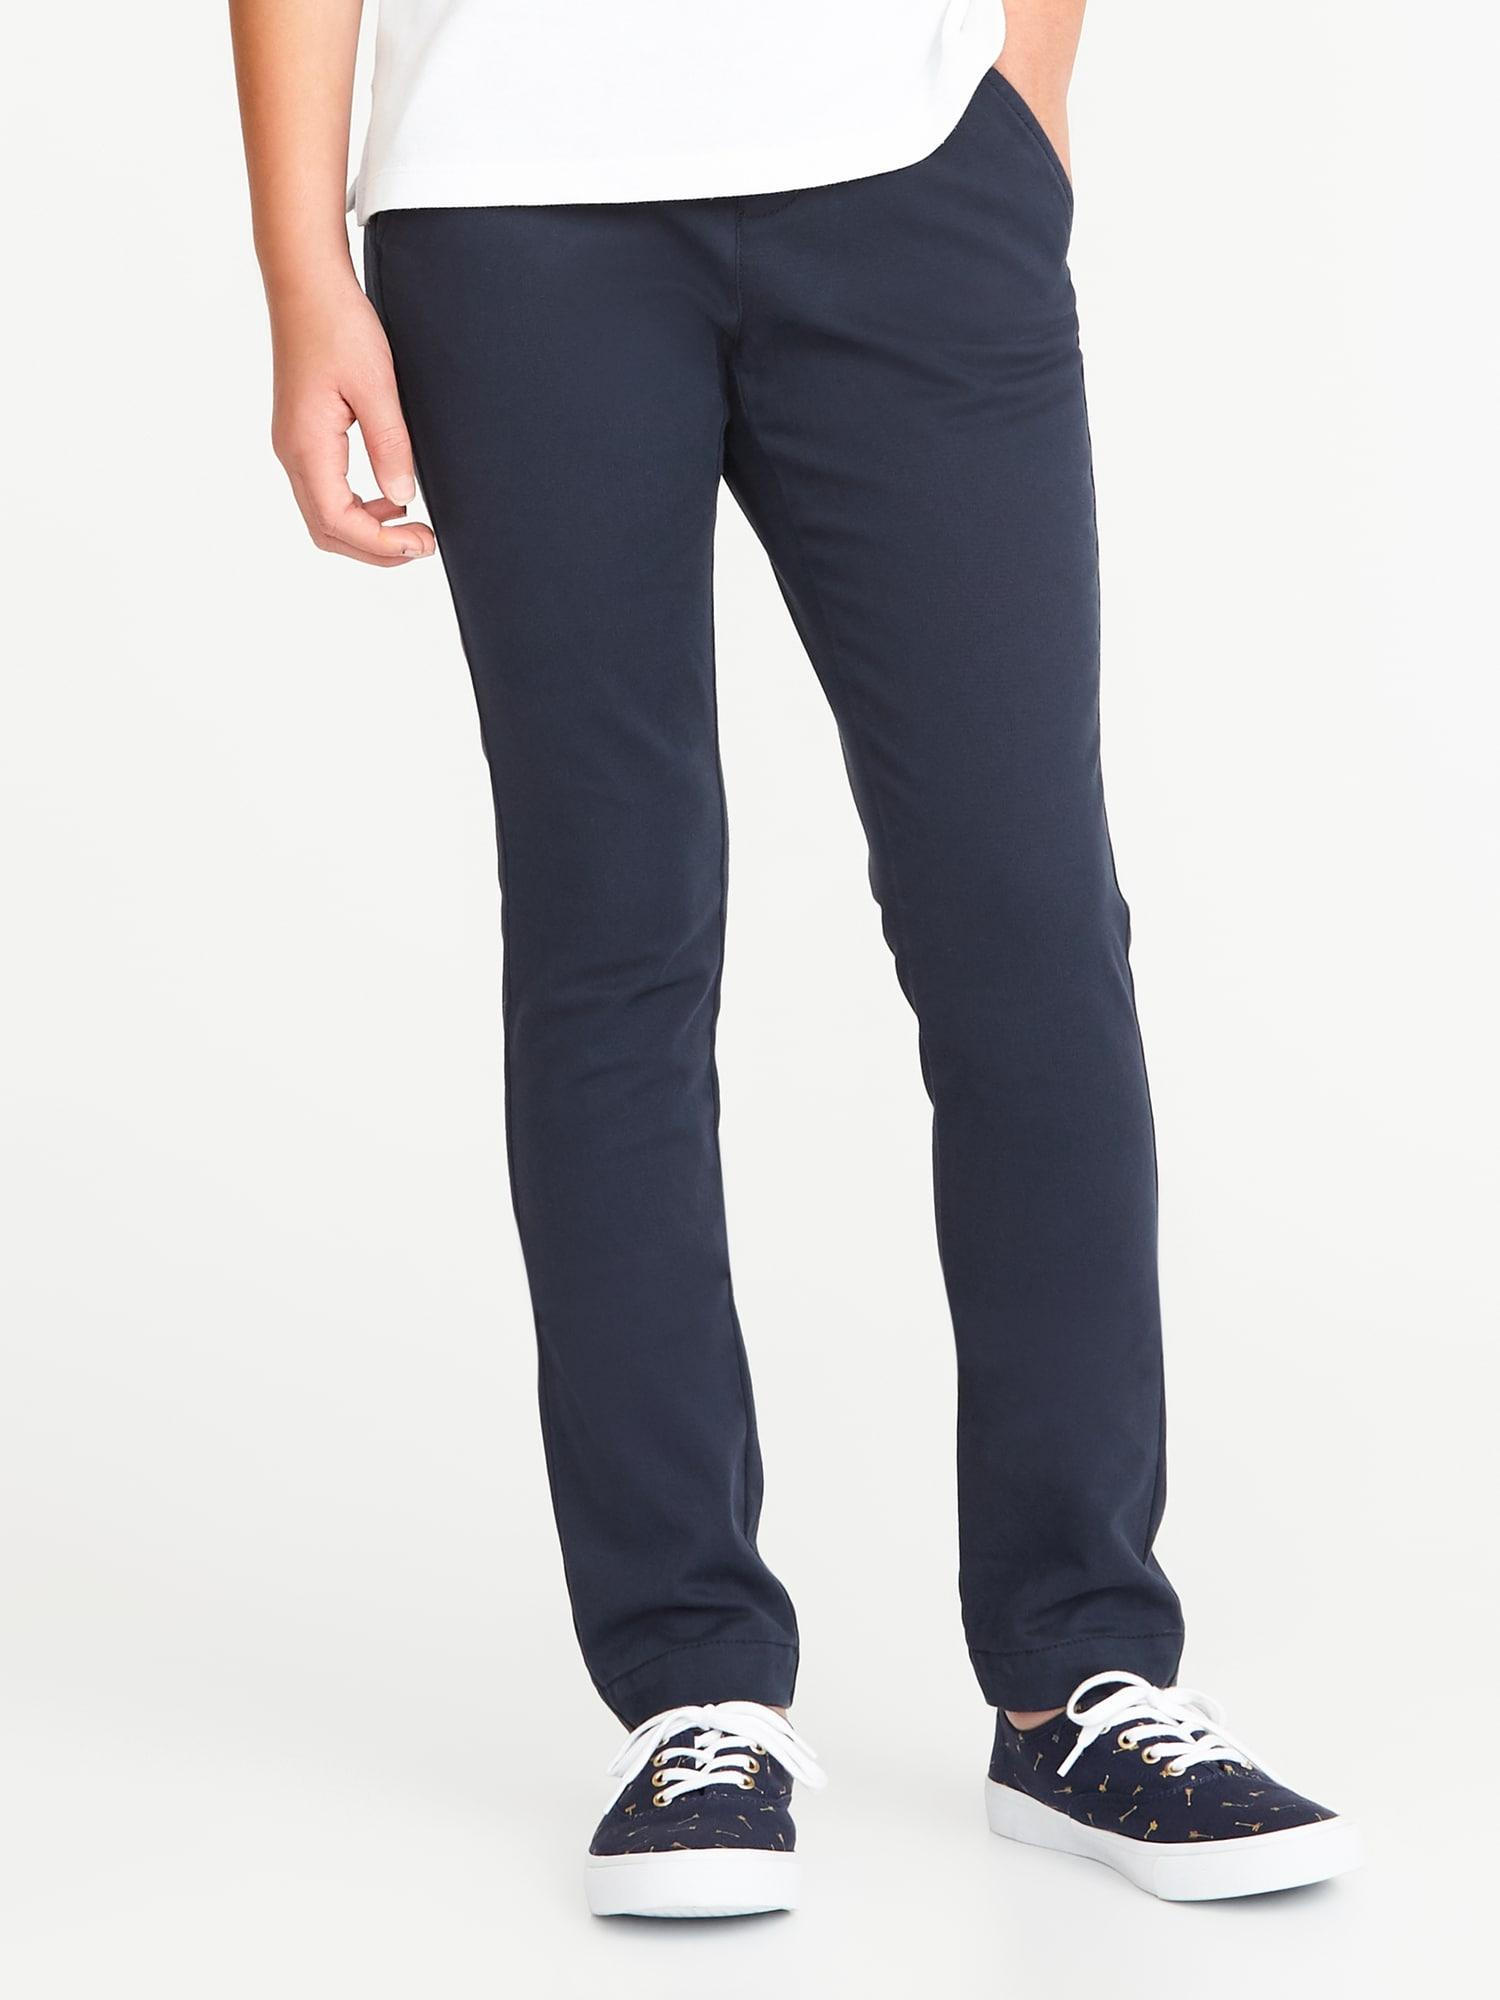 Old Navy Boys' Go-Dry Track Pants, Girls' Uniform Pants & Ponte-Knit Jeggings: Mix/Match 5 for $30 AFTER $20 Super Cash Redemption + FS